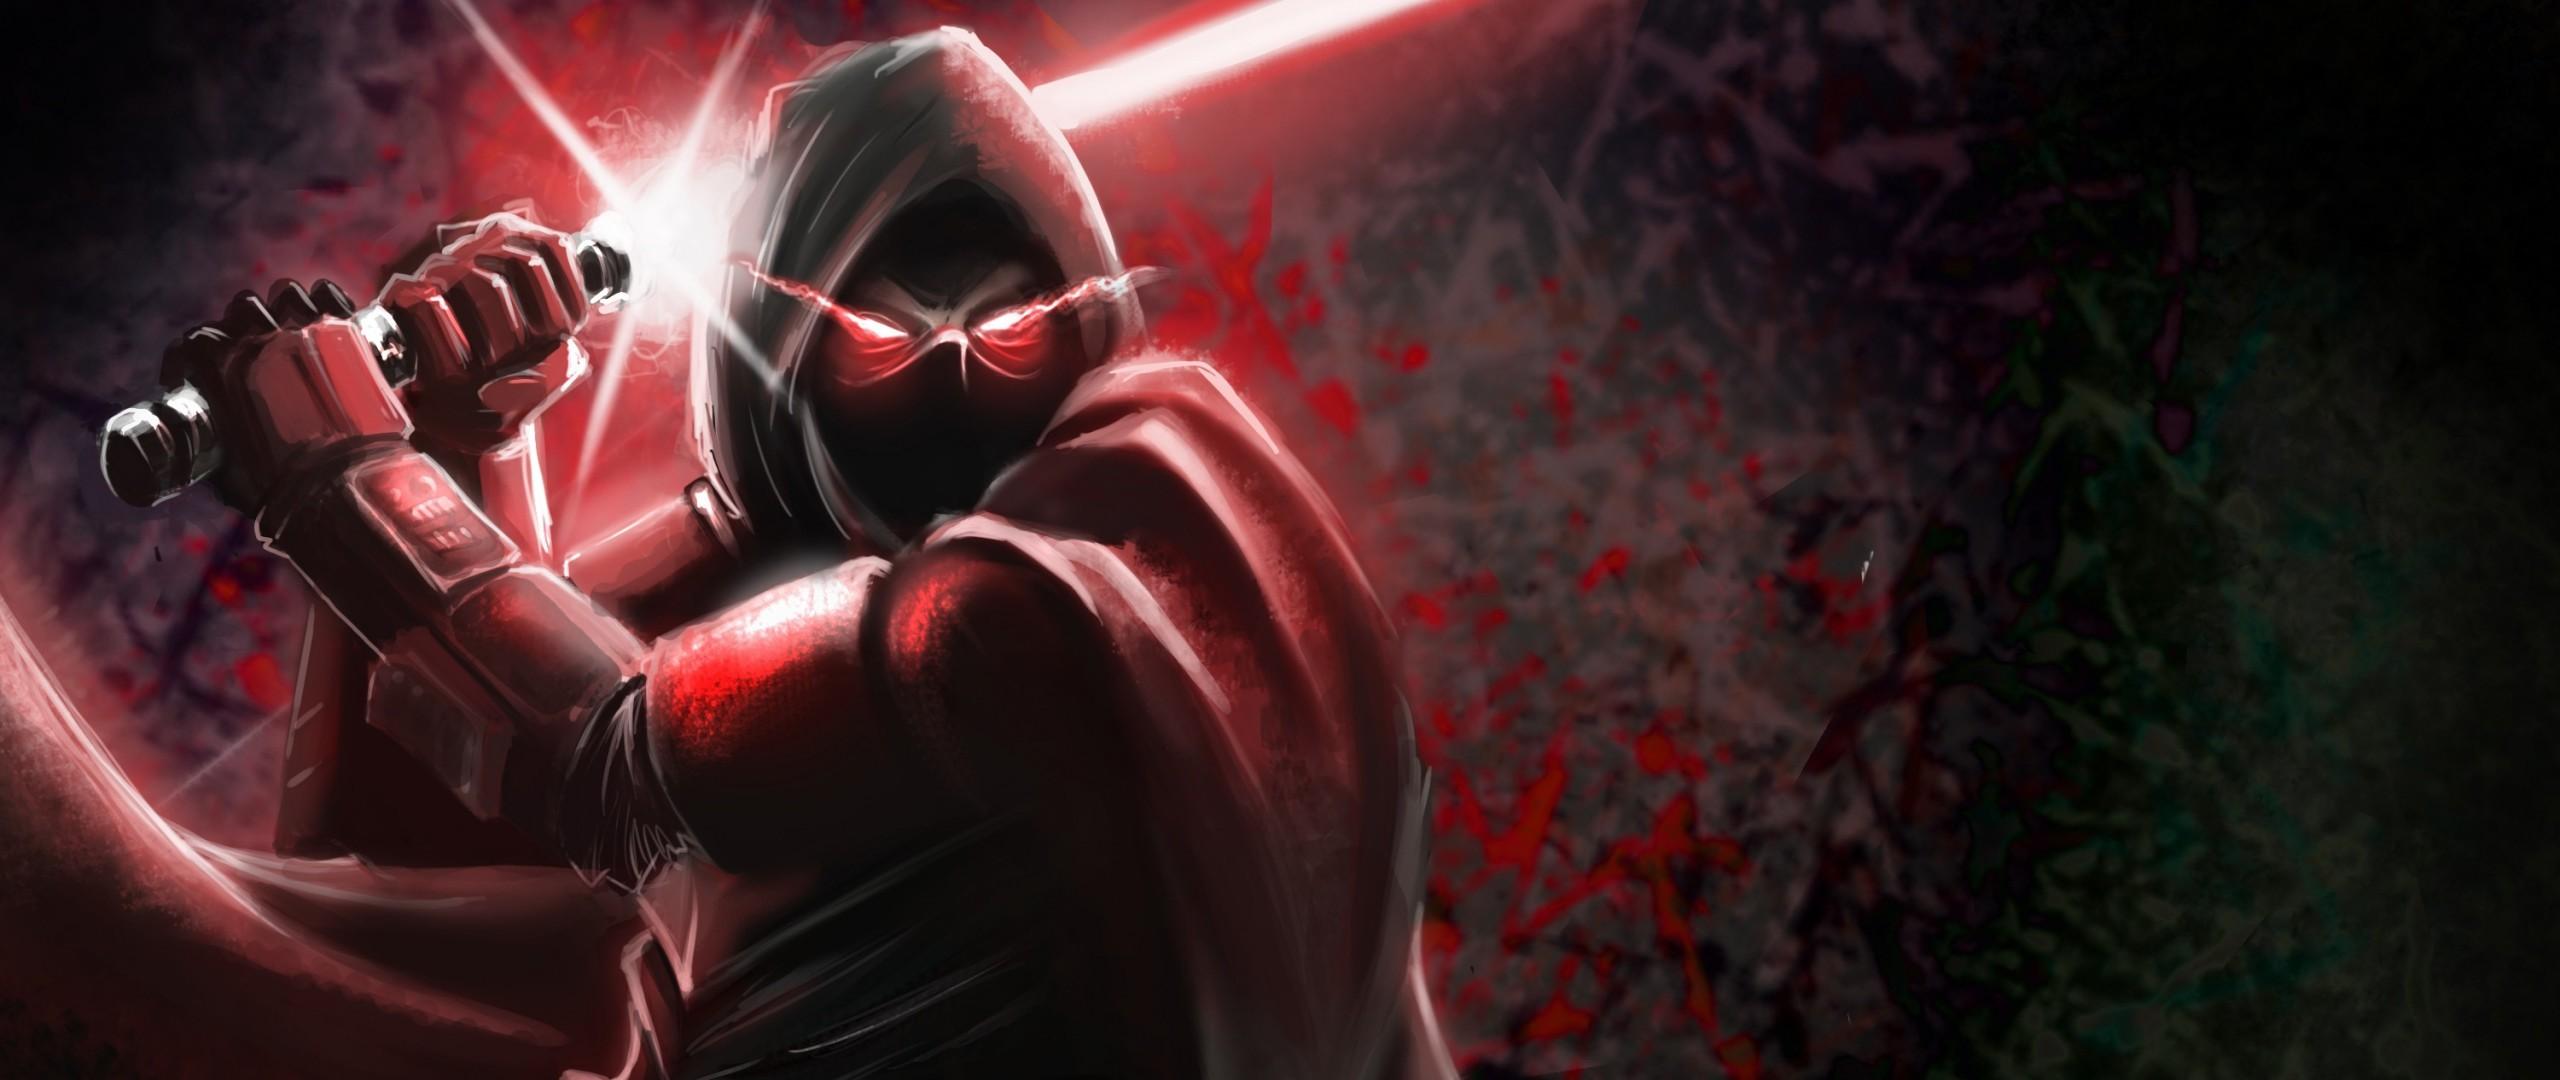 Wallpaper sith, star wars, art, dark side